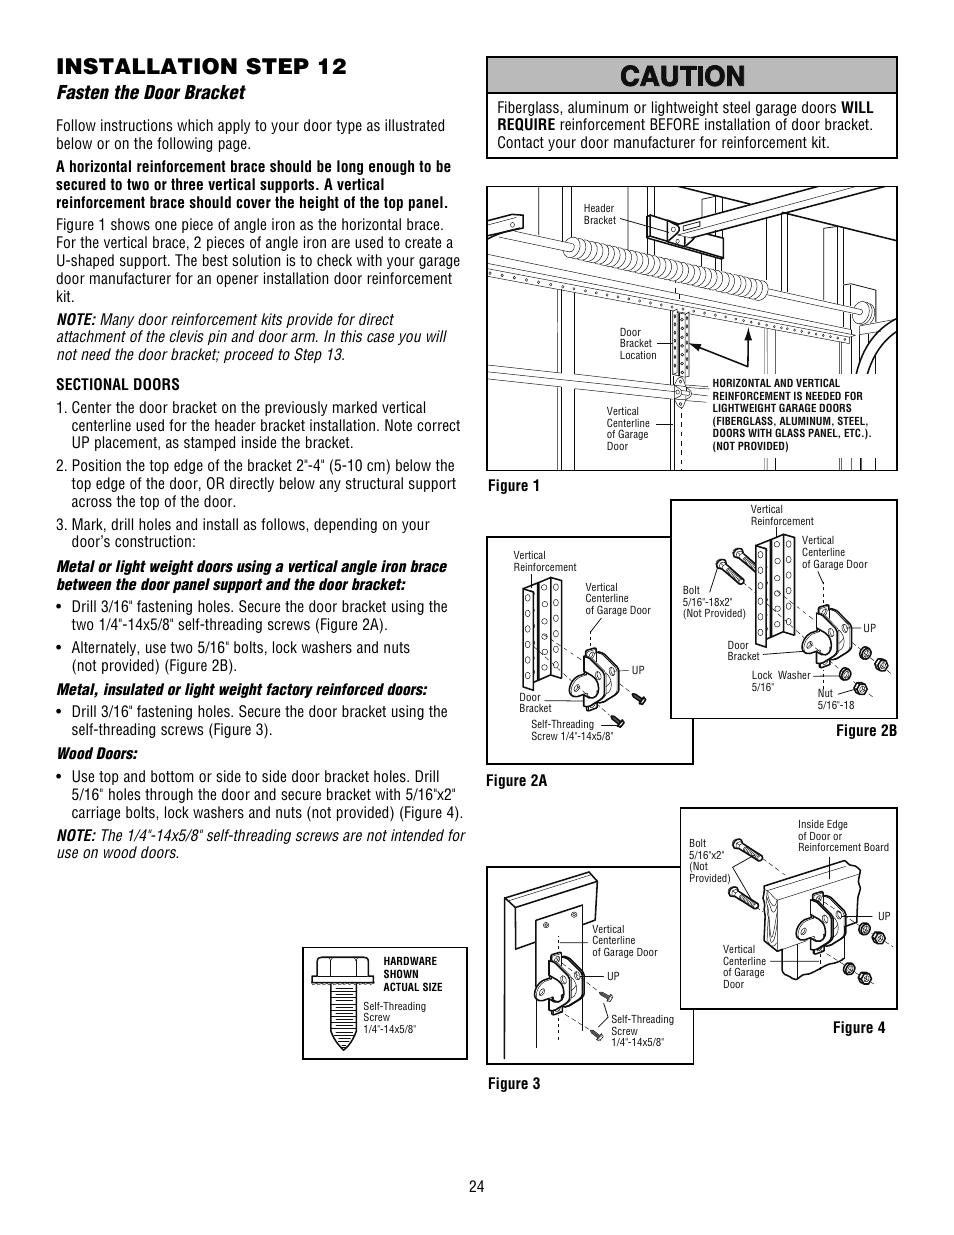 Fasten the door bracket, Installation step 12 | Chamberlain WHISPER DRIVE  HD900D User Manual | Page 24 / 88